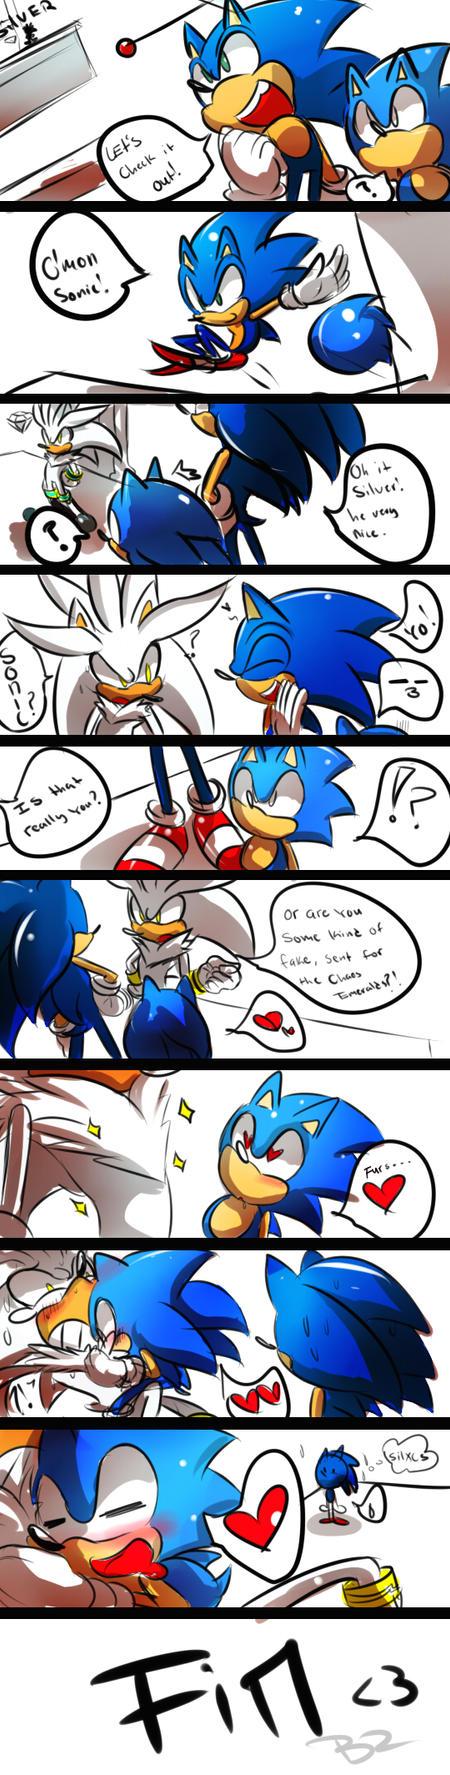 Sonic generations - Meets Silver Boss by Zubwayori